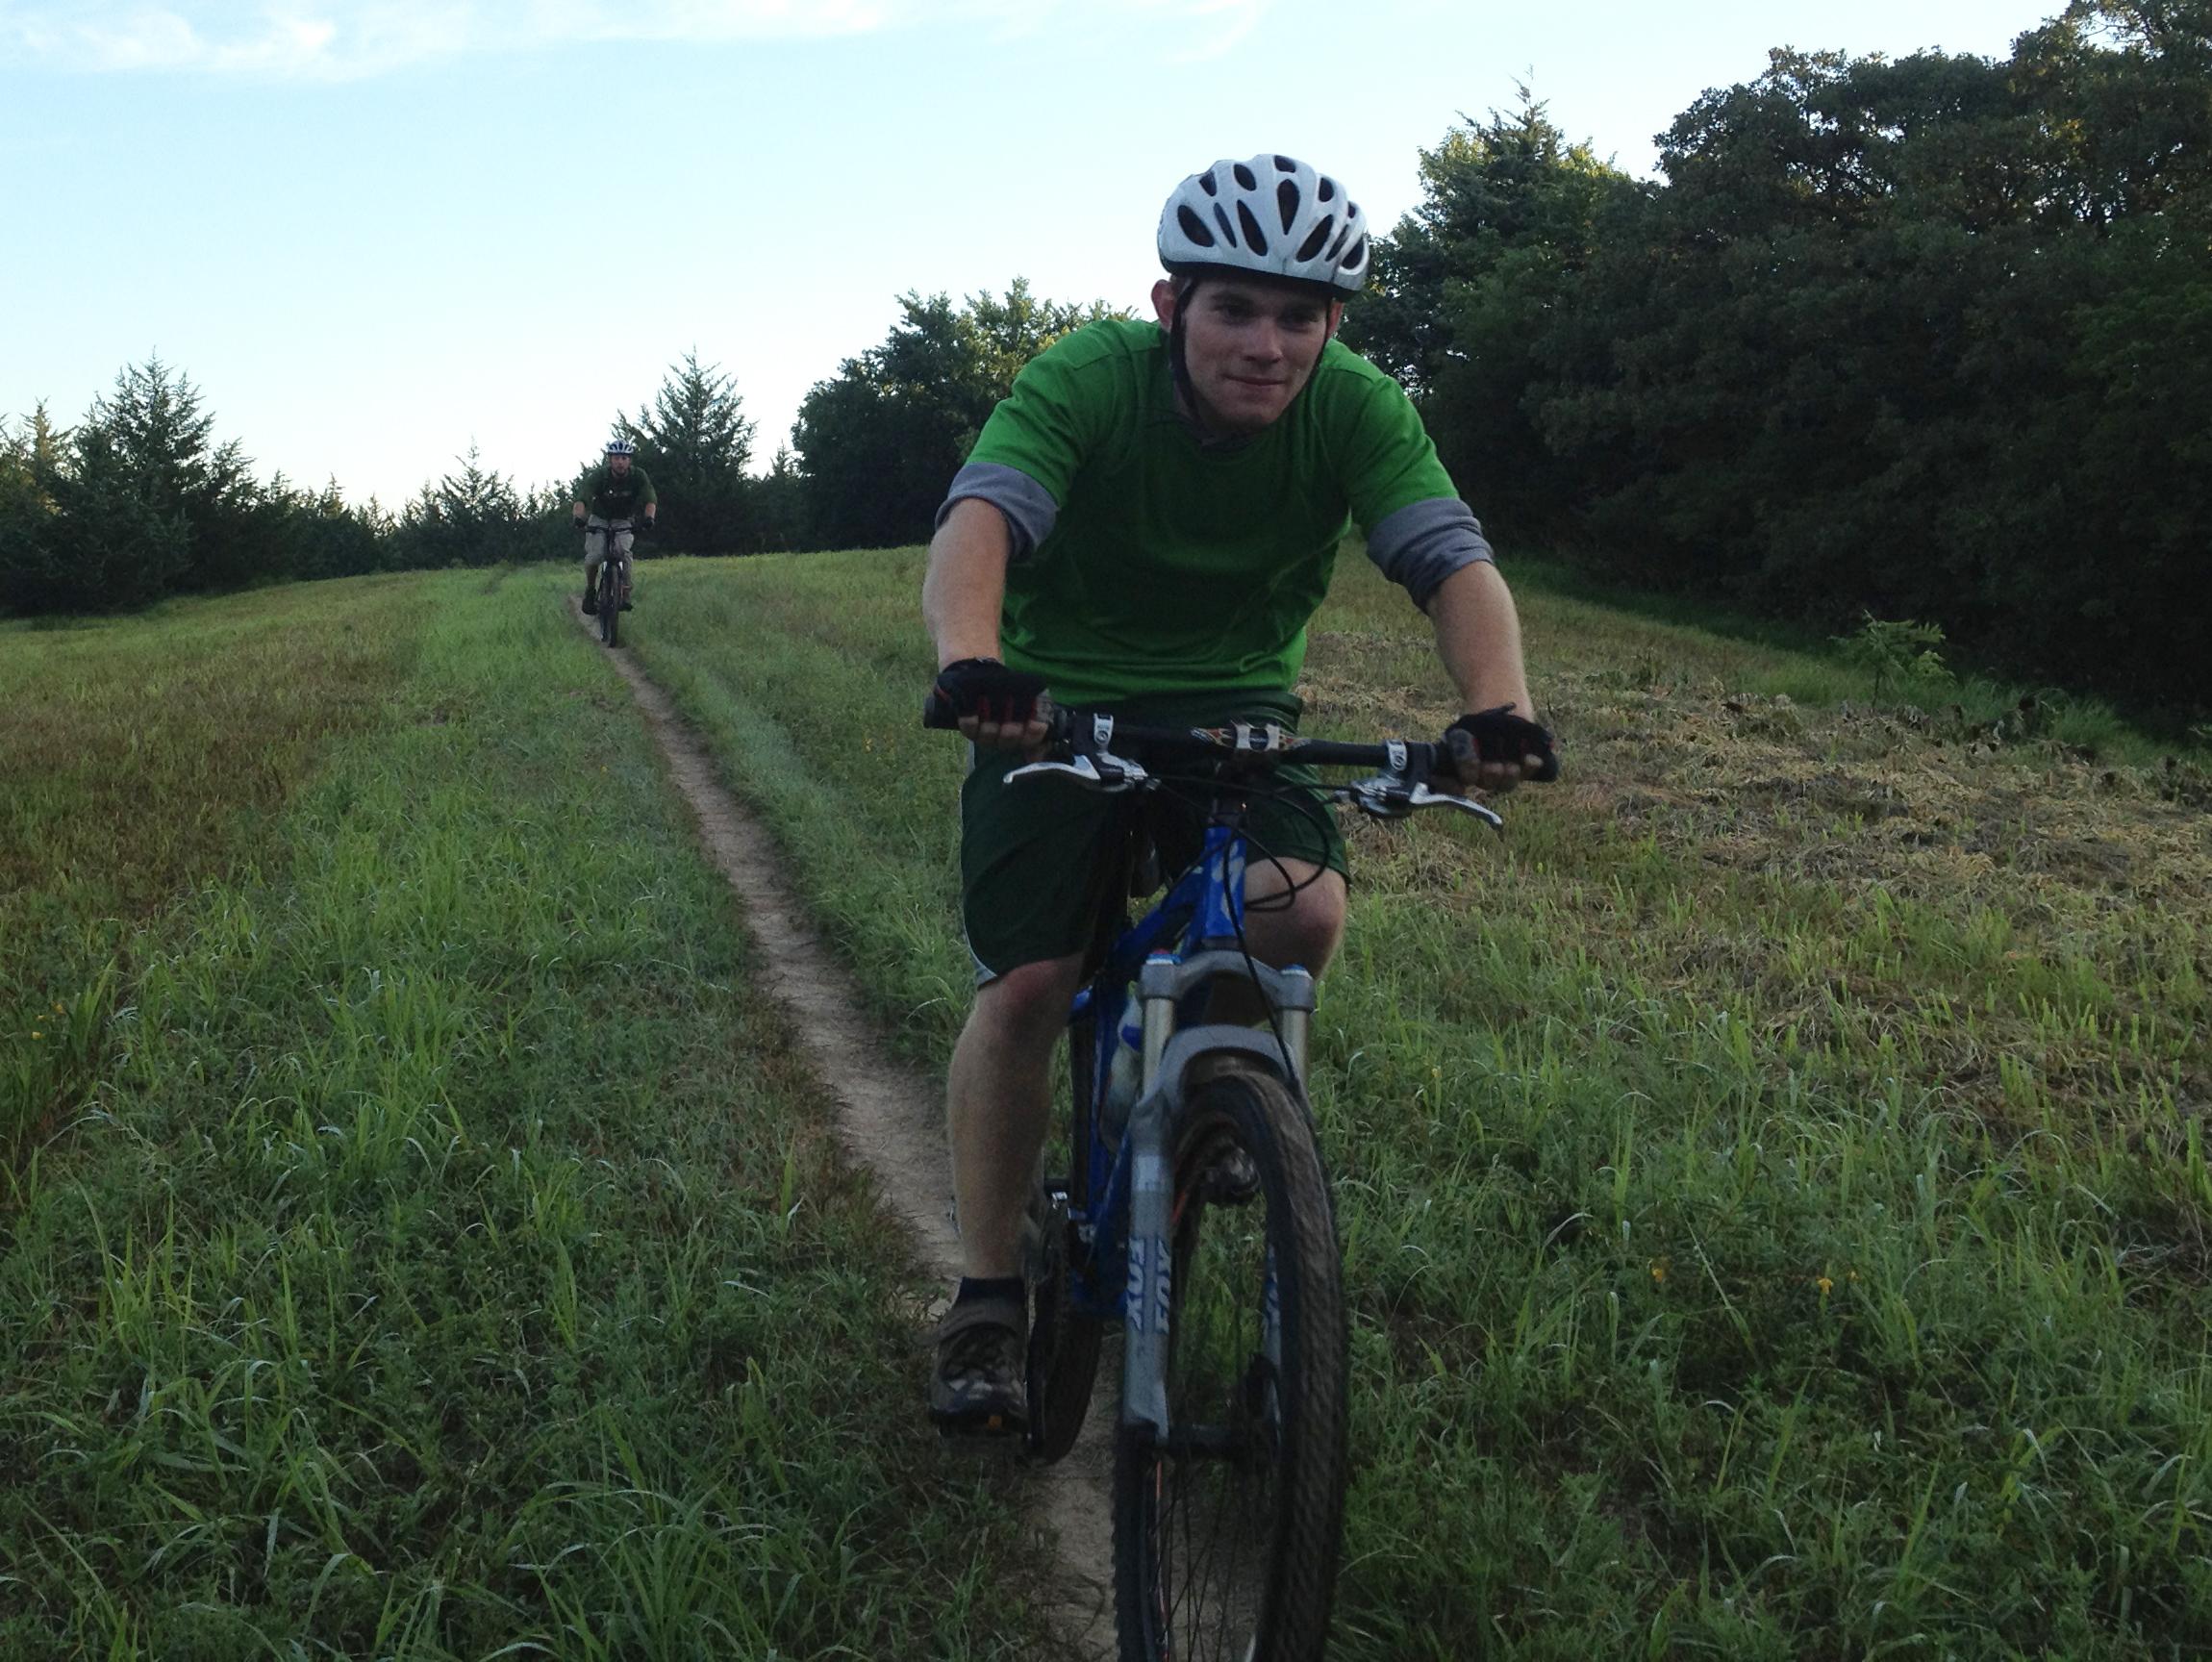 University of Nebraska–Lincoln's Outdoor Adventures Center is hosting Van Dorn Intro to Mountain Biking on March 16, 2021.